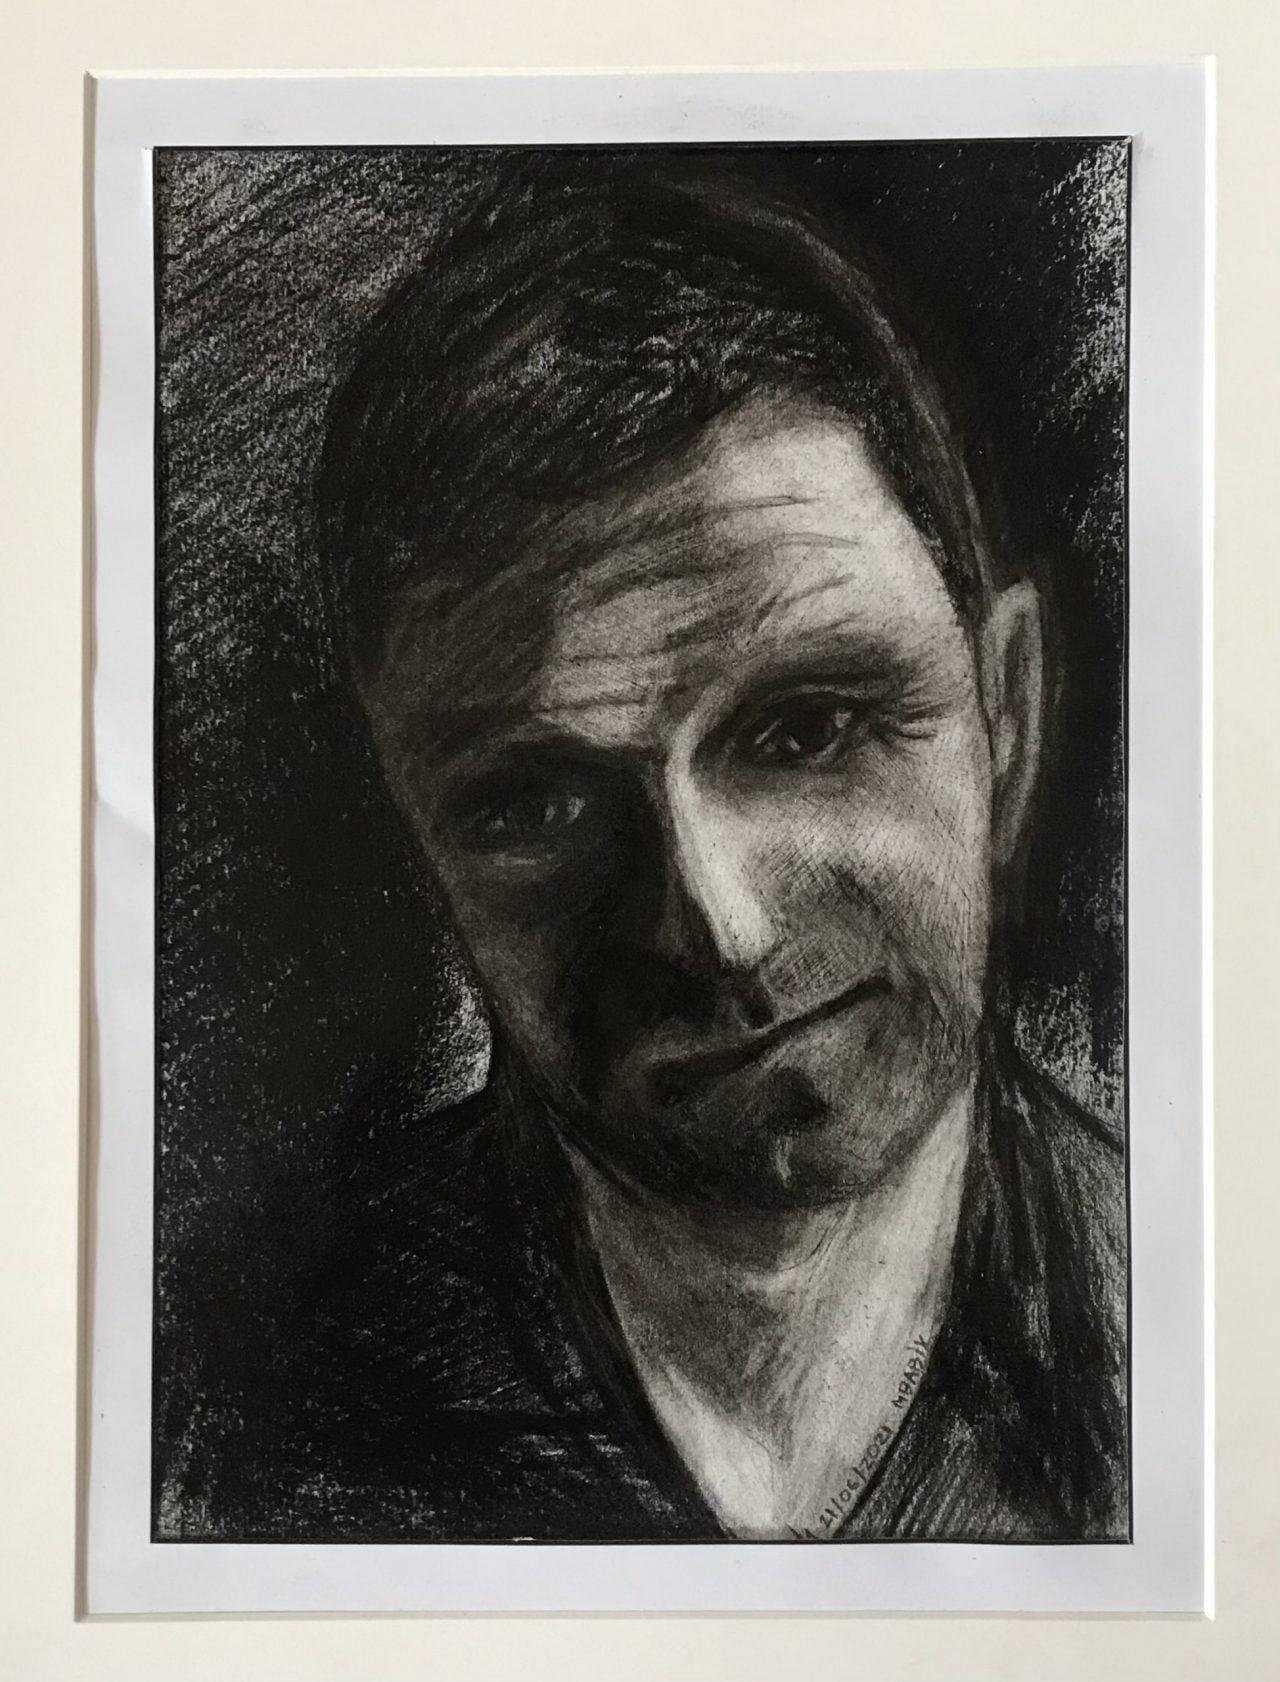 Mykola Babiy. Self-portrait. Charcoal drawing. Practicing.